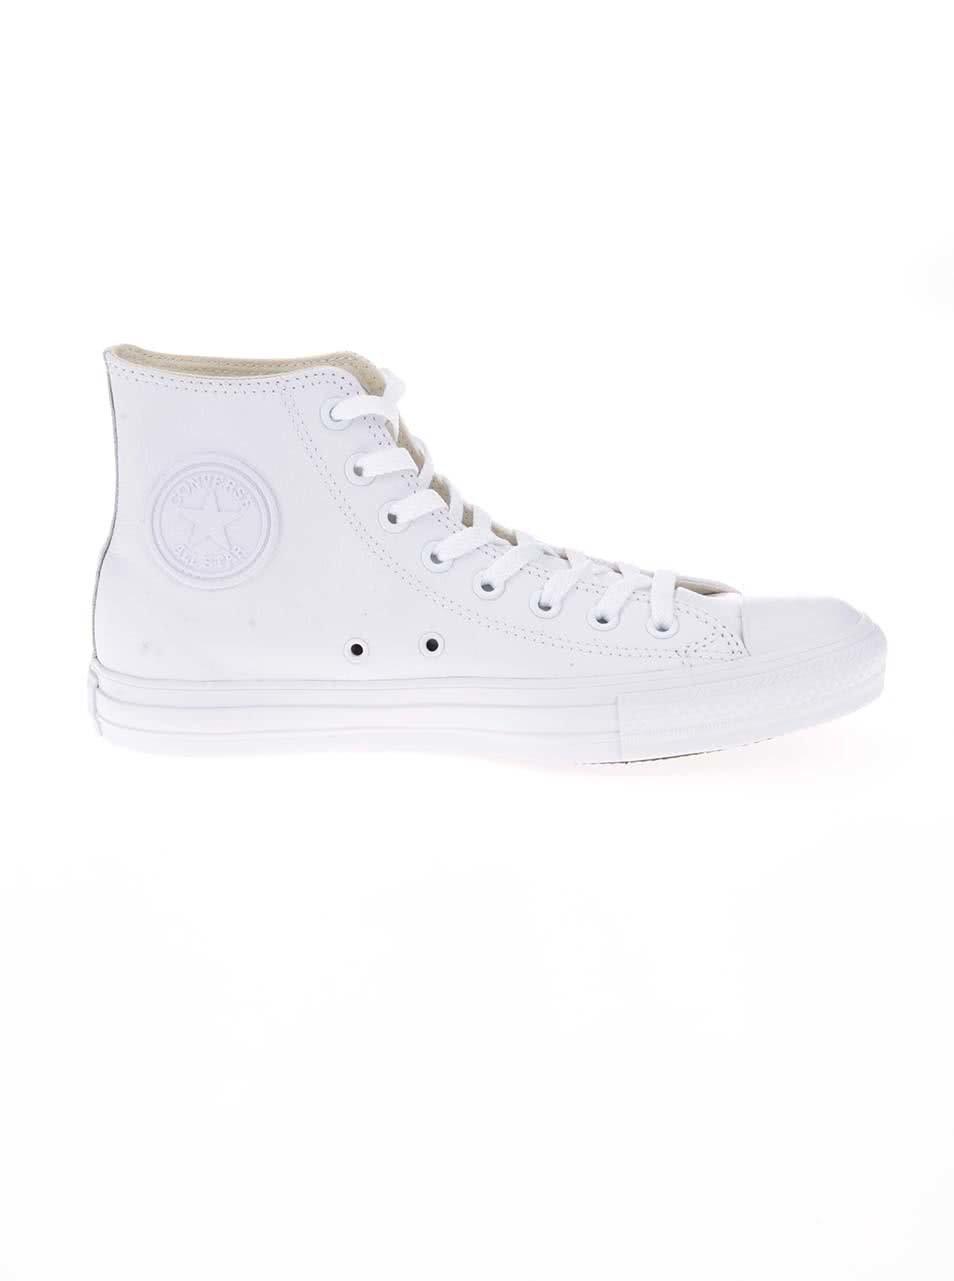 Bílé unisex kožené kotníkové tenisky s logem Converse Chuck Taylor All Star  ... e09b633b88